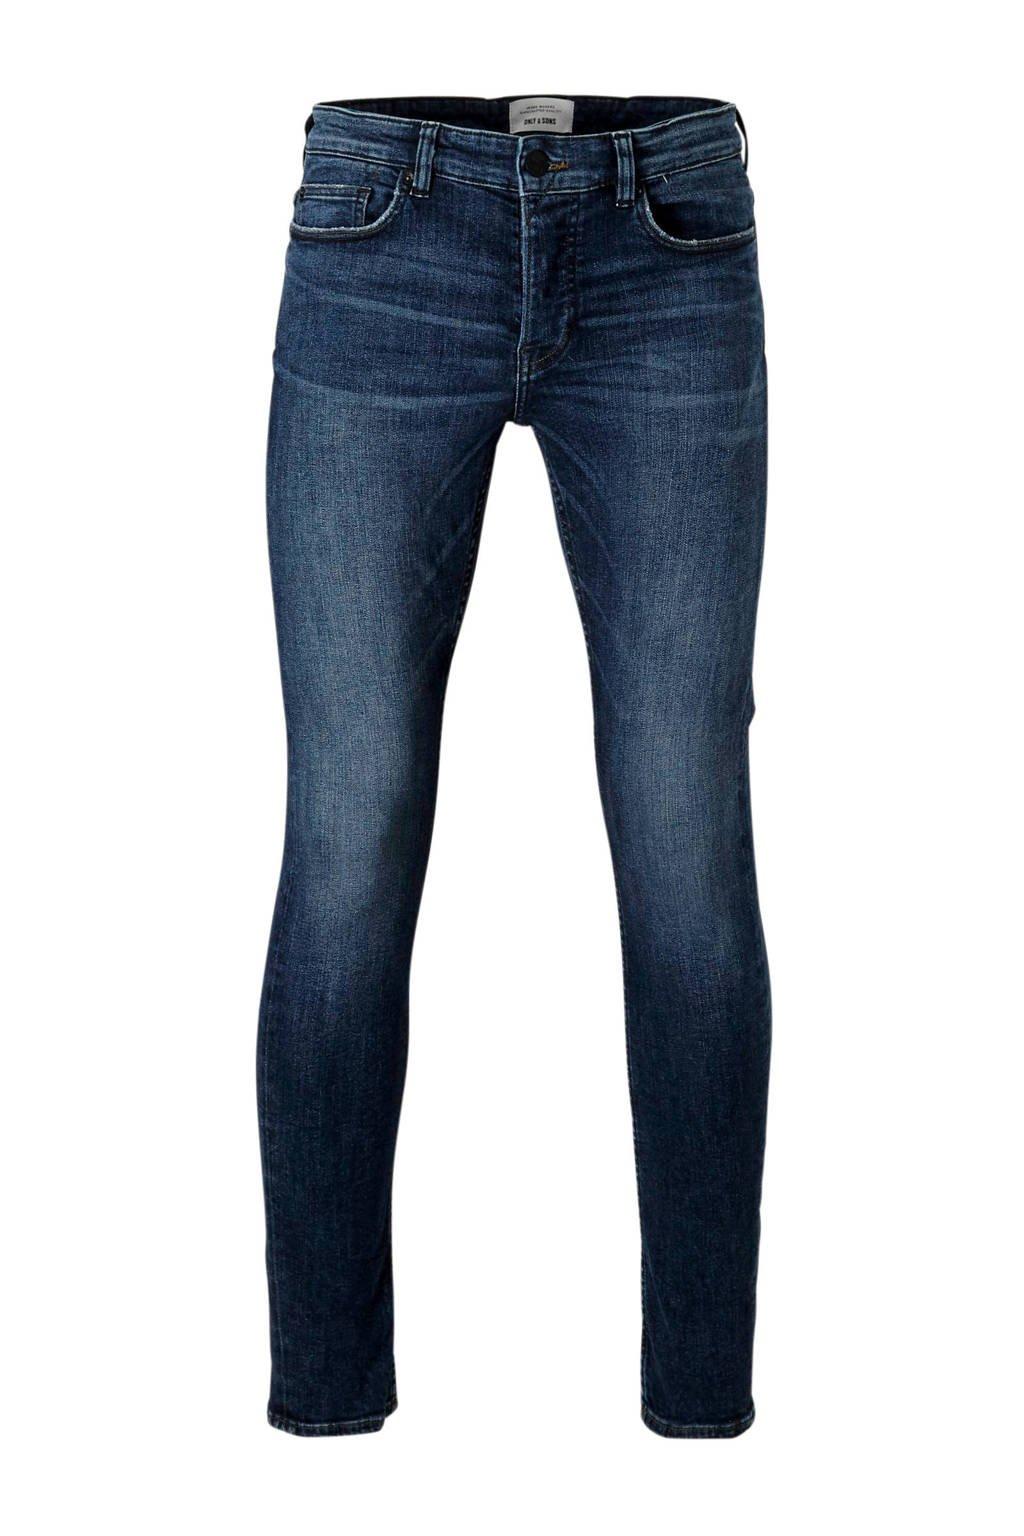 Only & Sons slim fit jeans, Dark denim